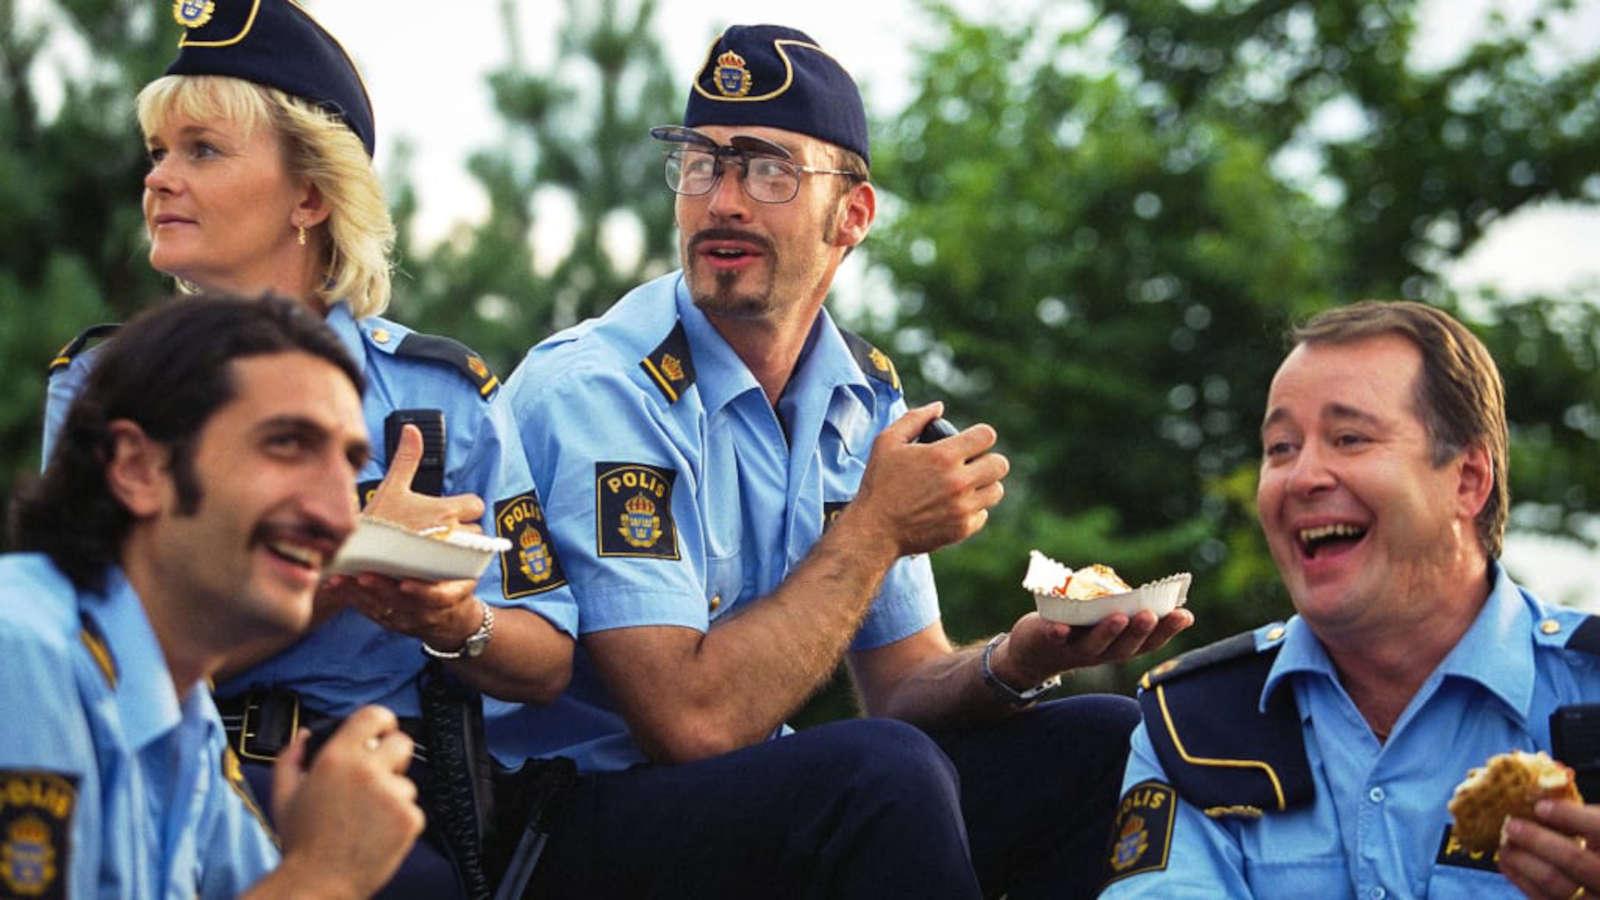 kopps Svenska polisfilmer